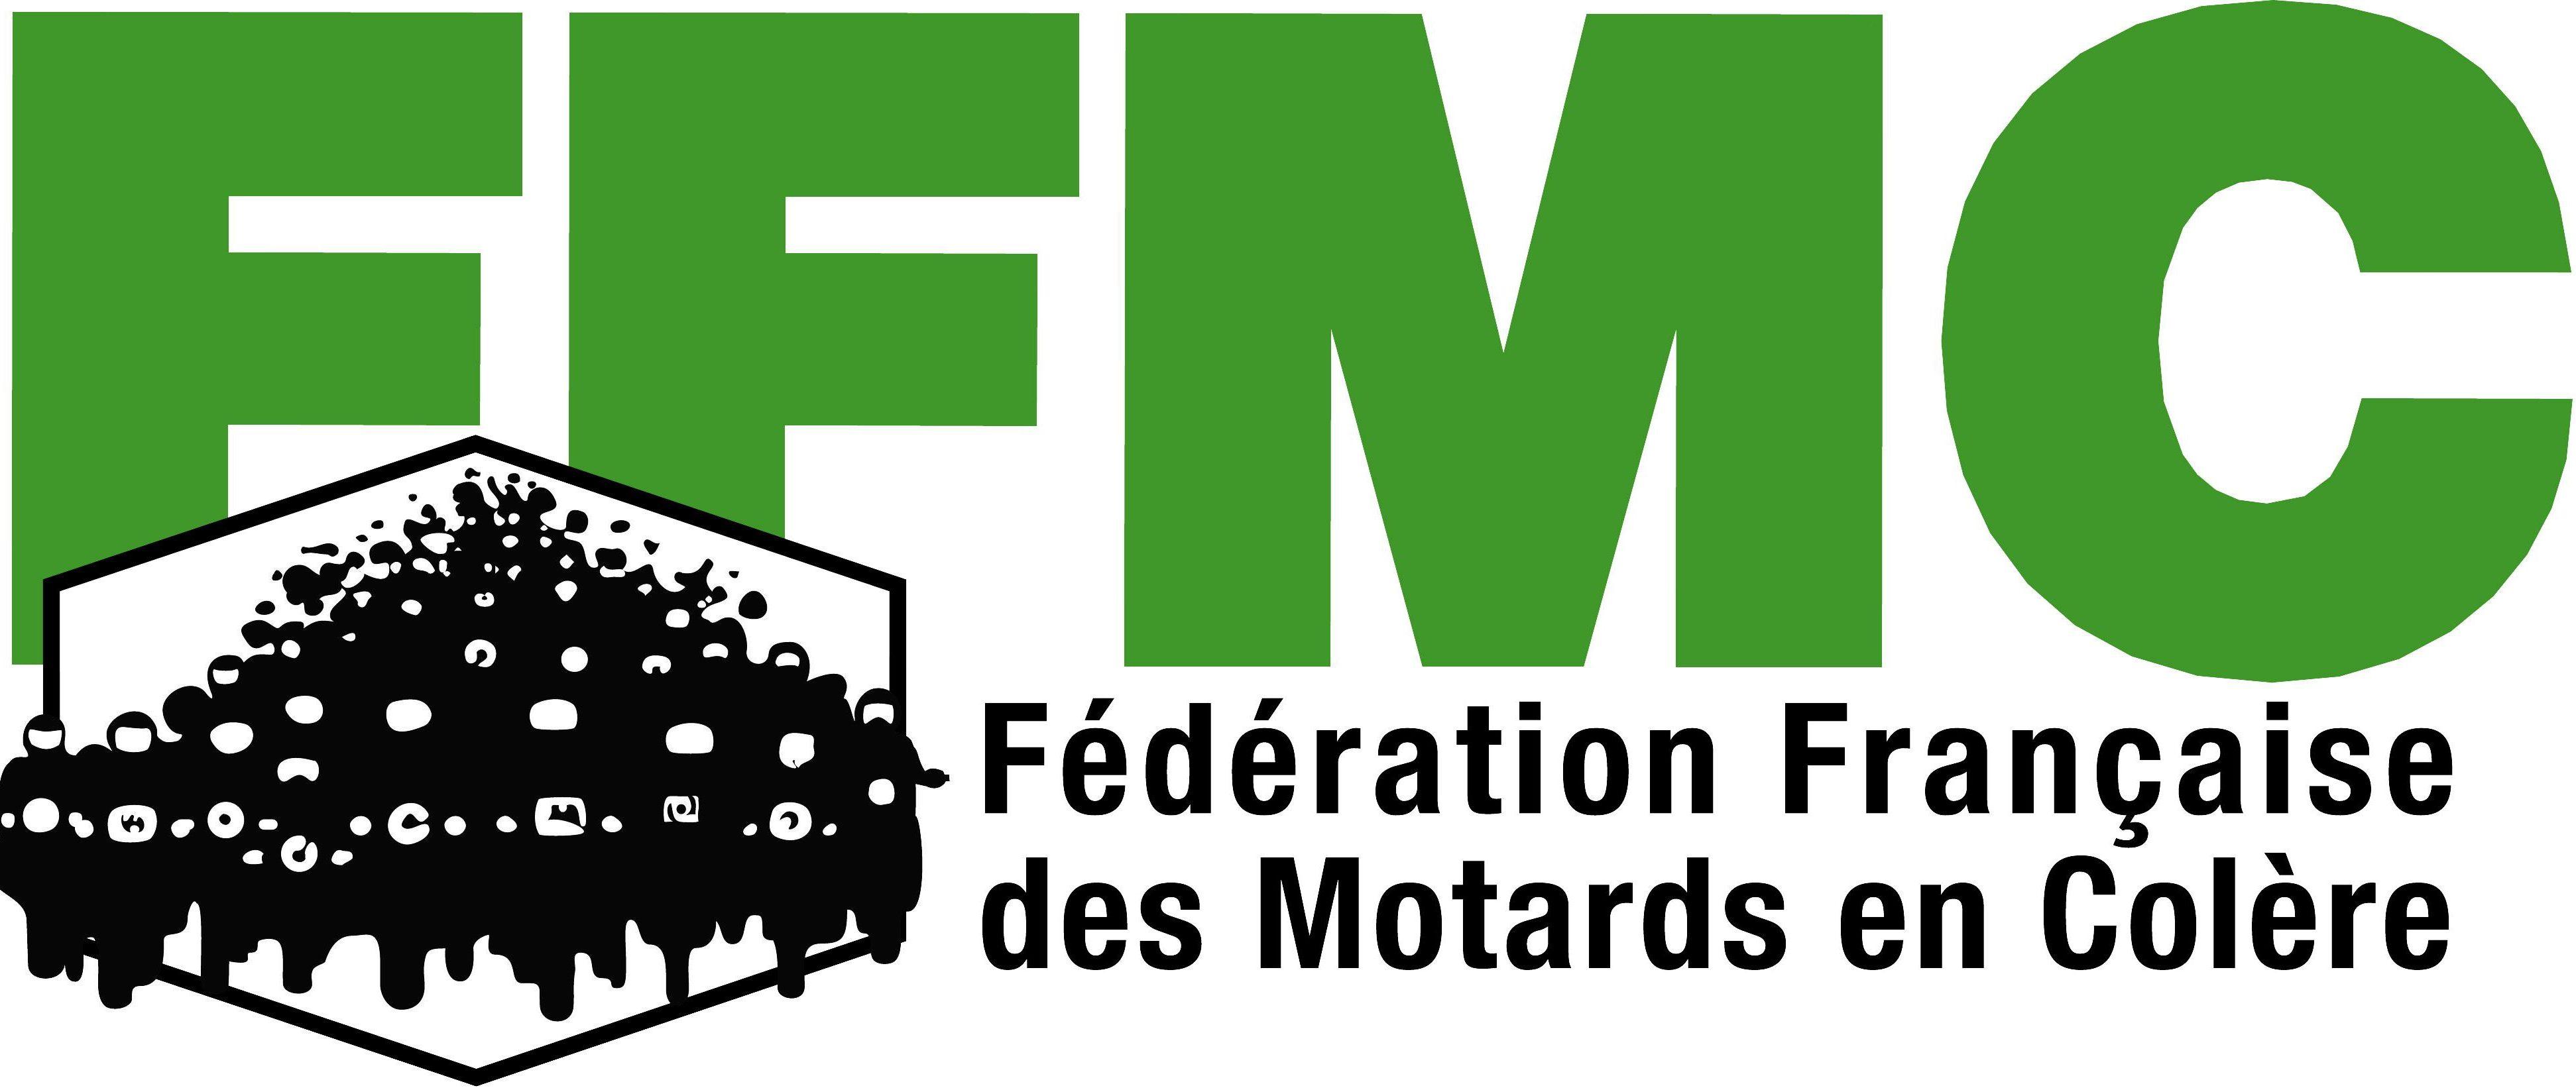 FFMC-big.jpg